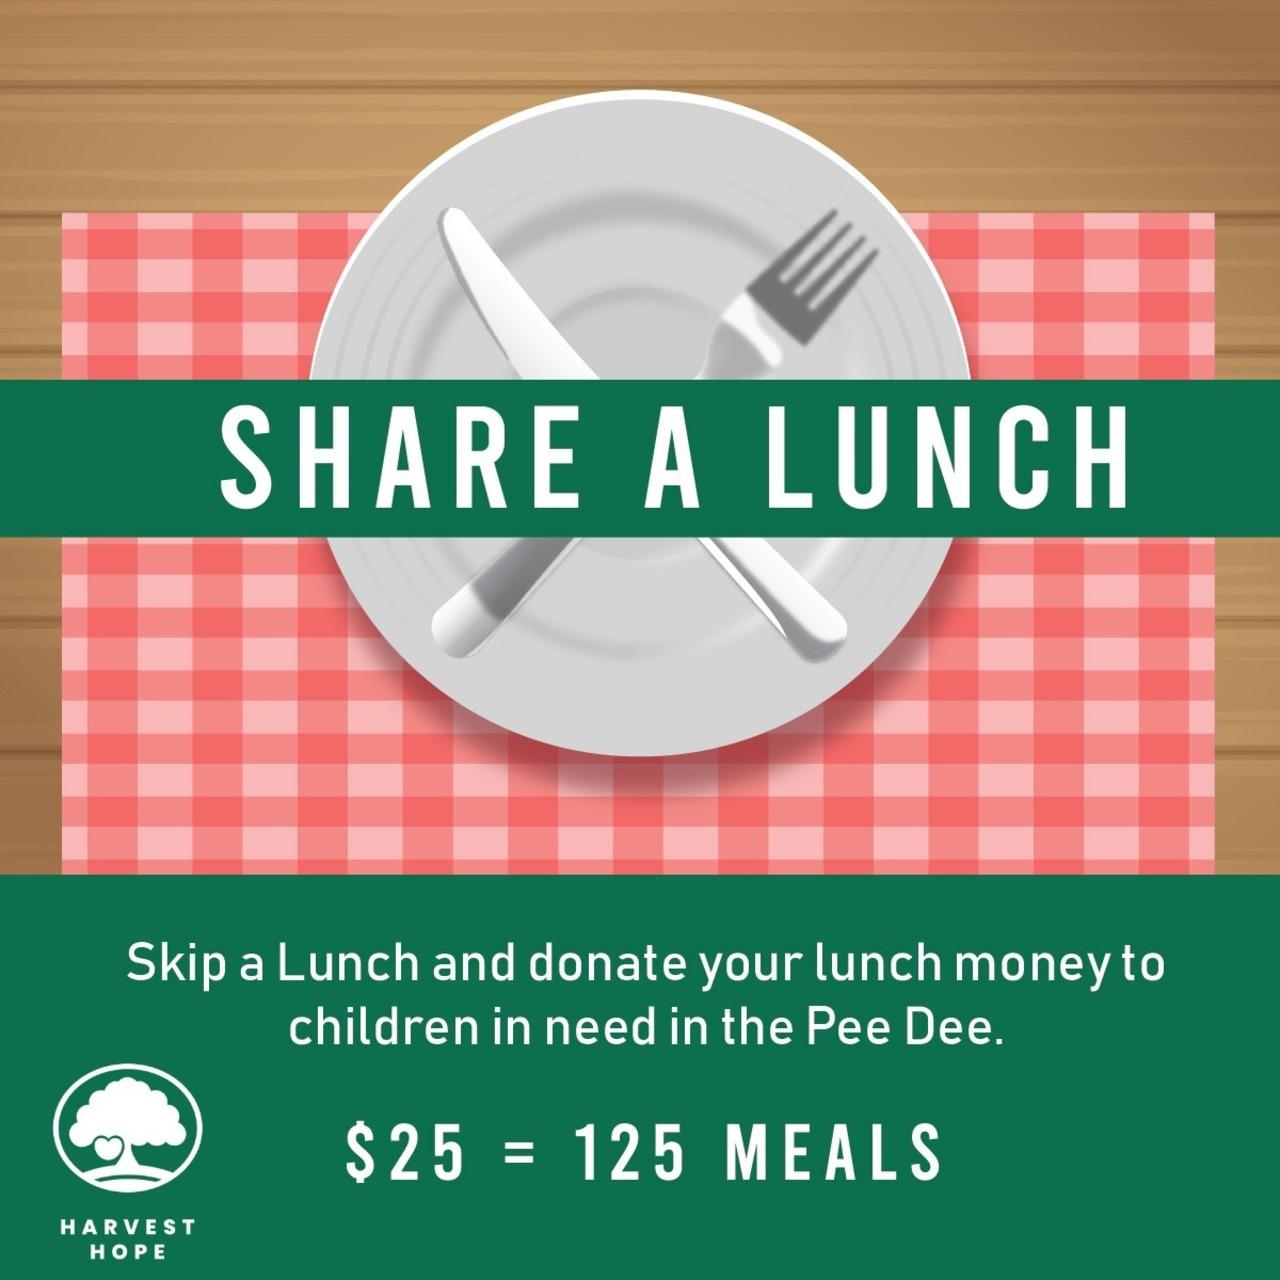 Erika Mills' Share a Lunch Fundraiser for Harvest Hope